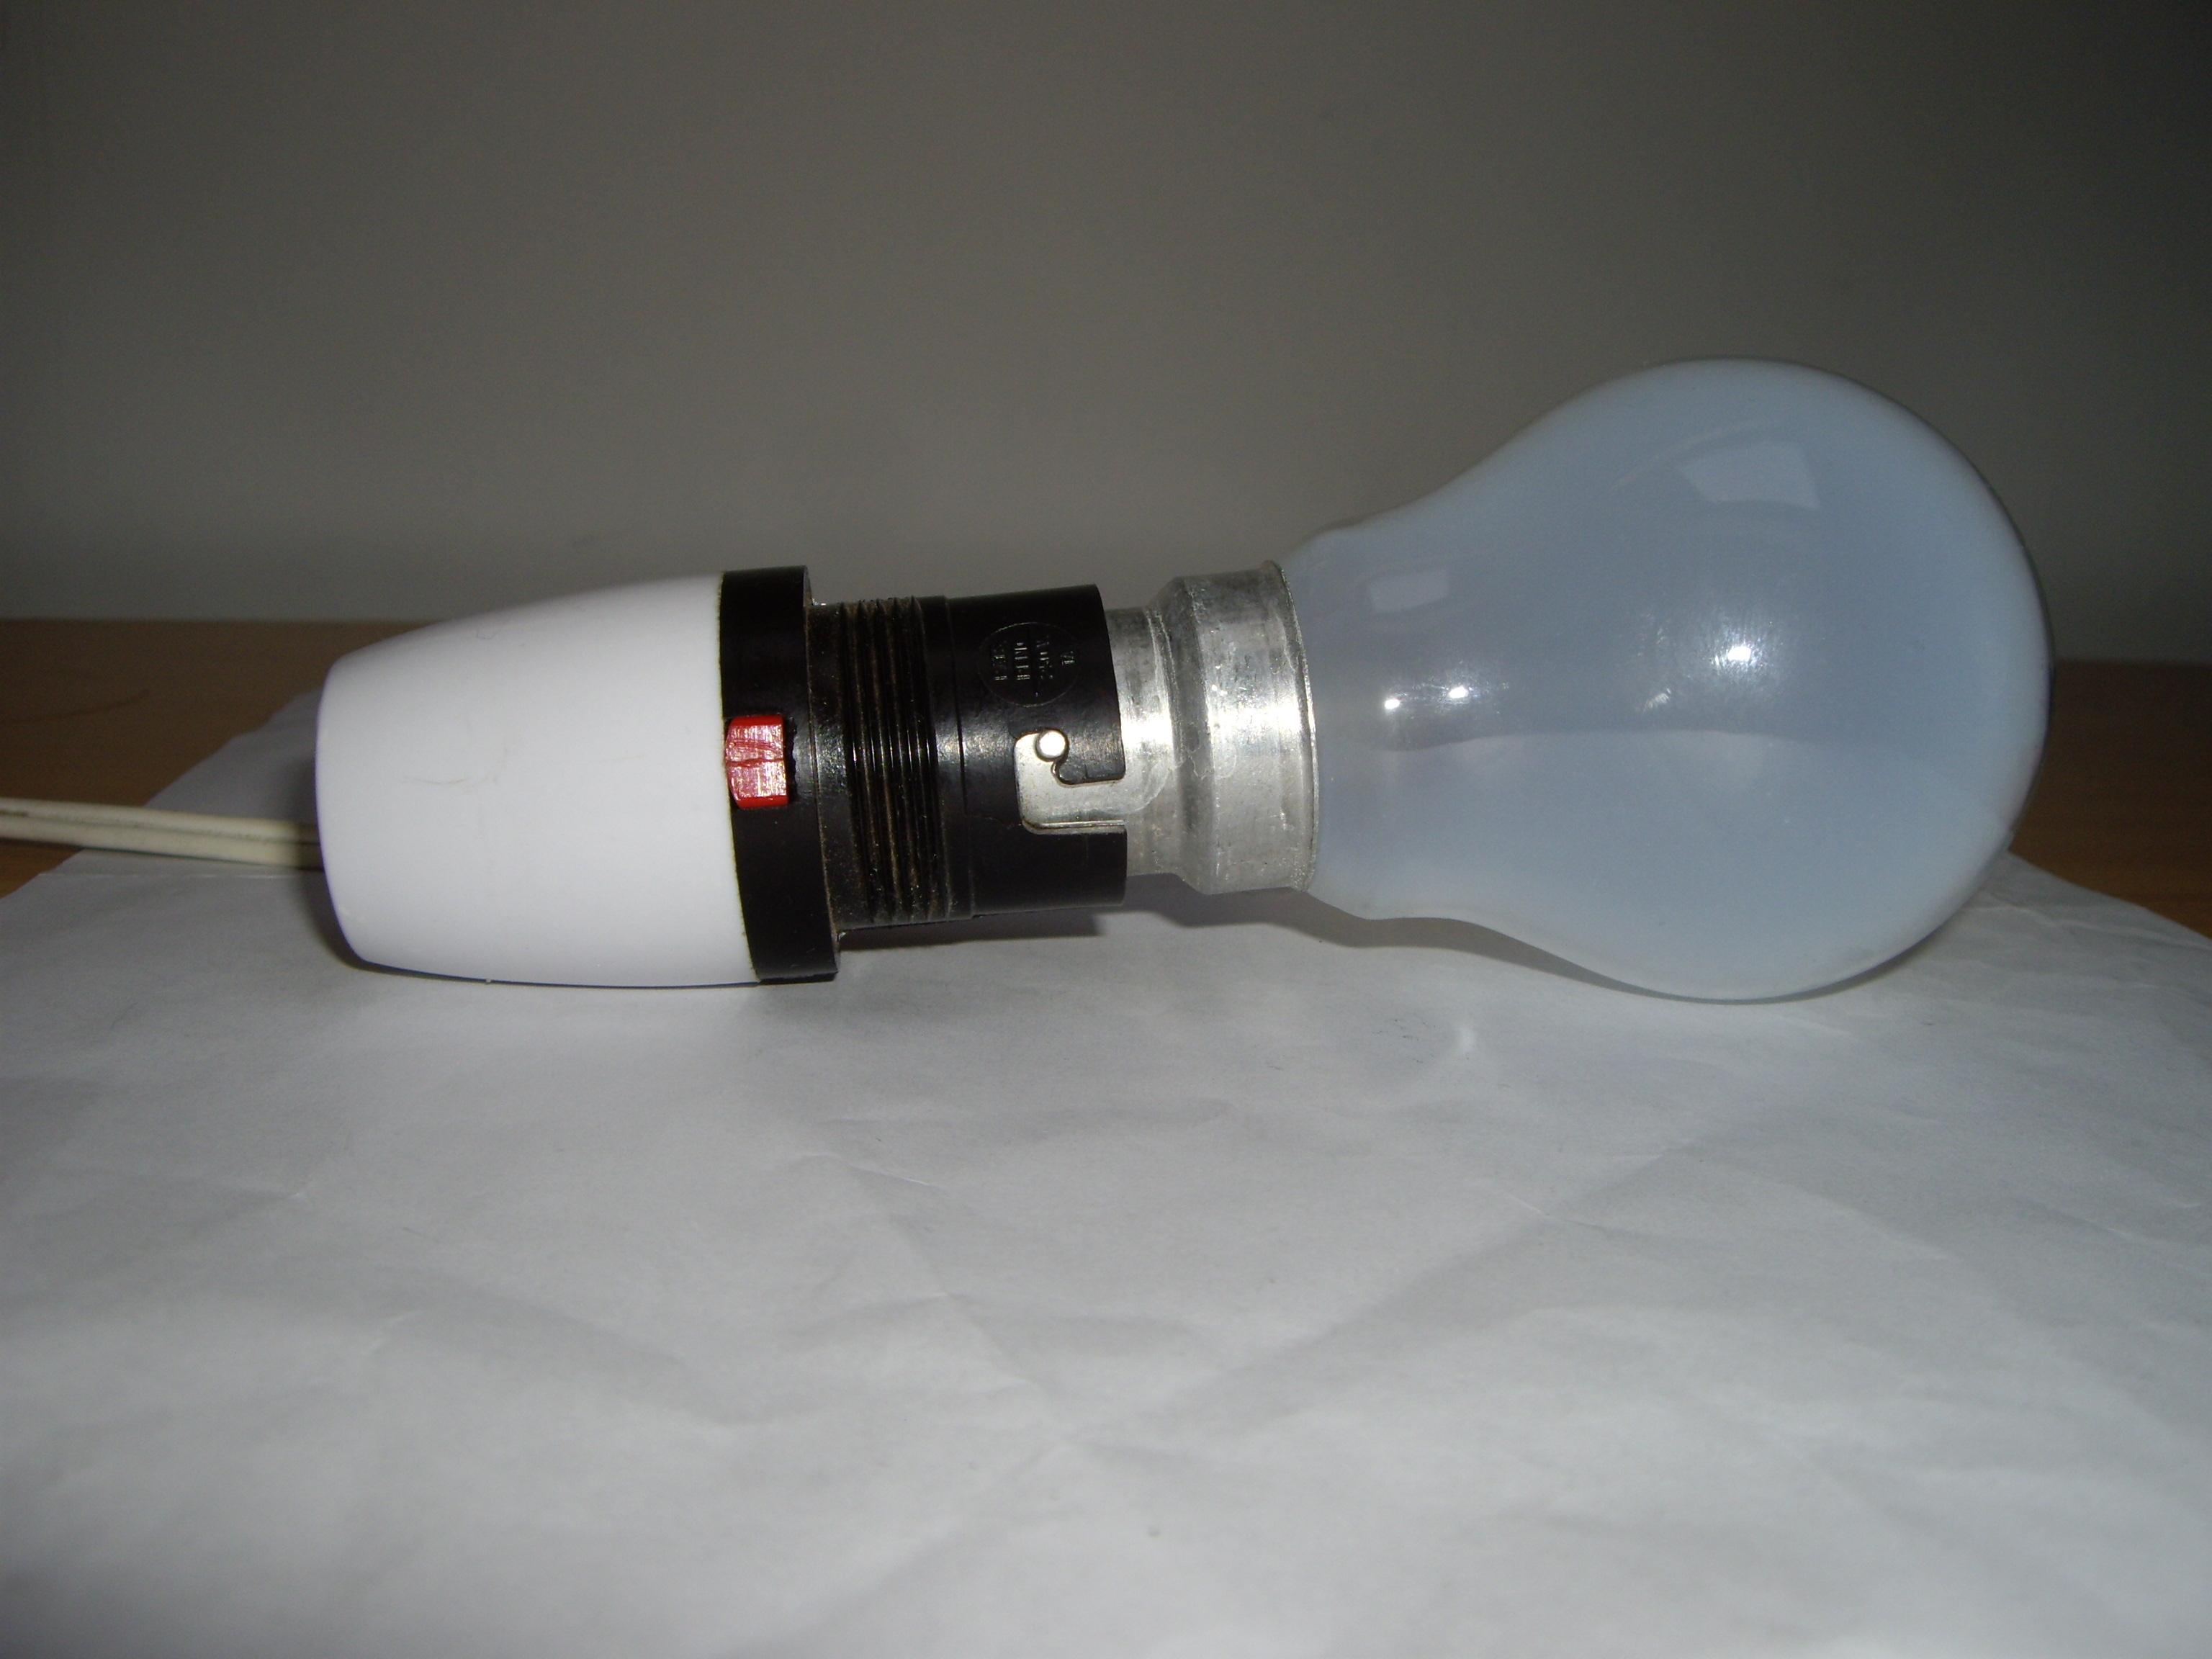 File:Bayonet lightbulb in socket.jpg - Wikimedia Commons